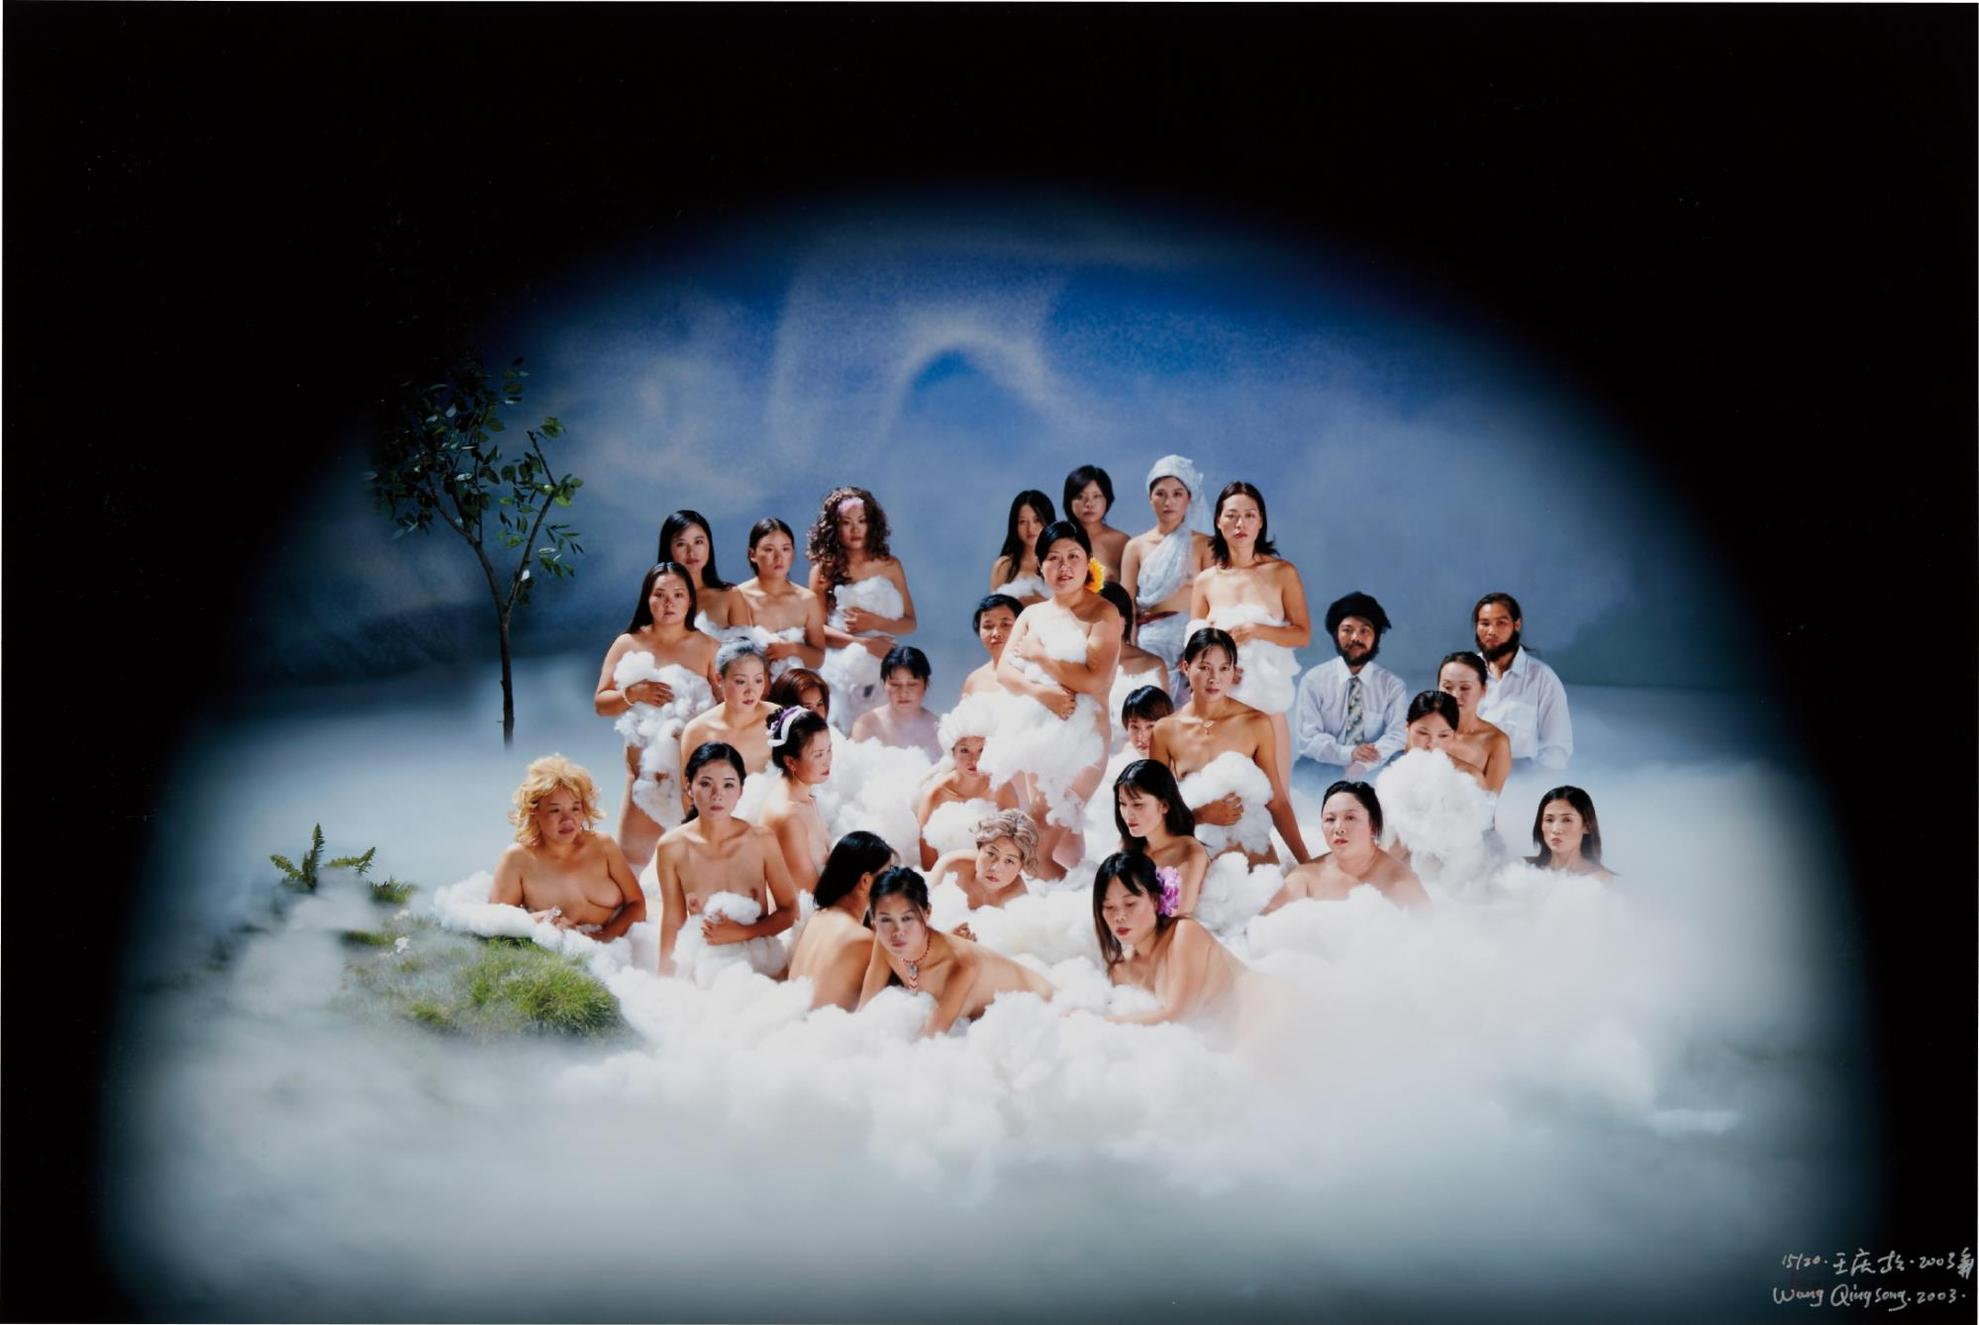 Wang Qingsong-Heaven-2003